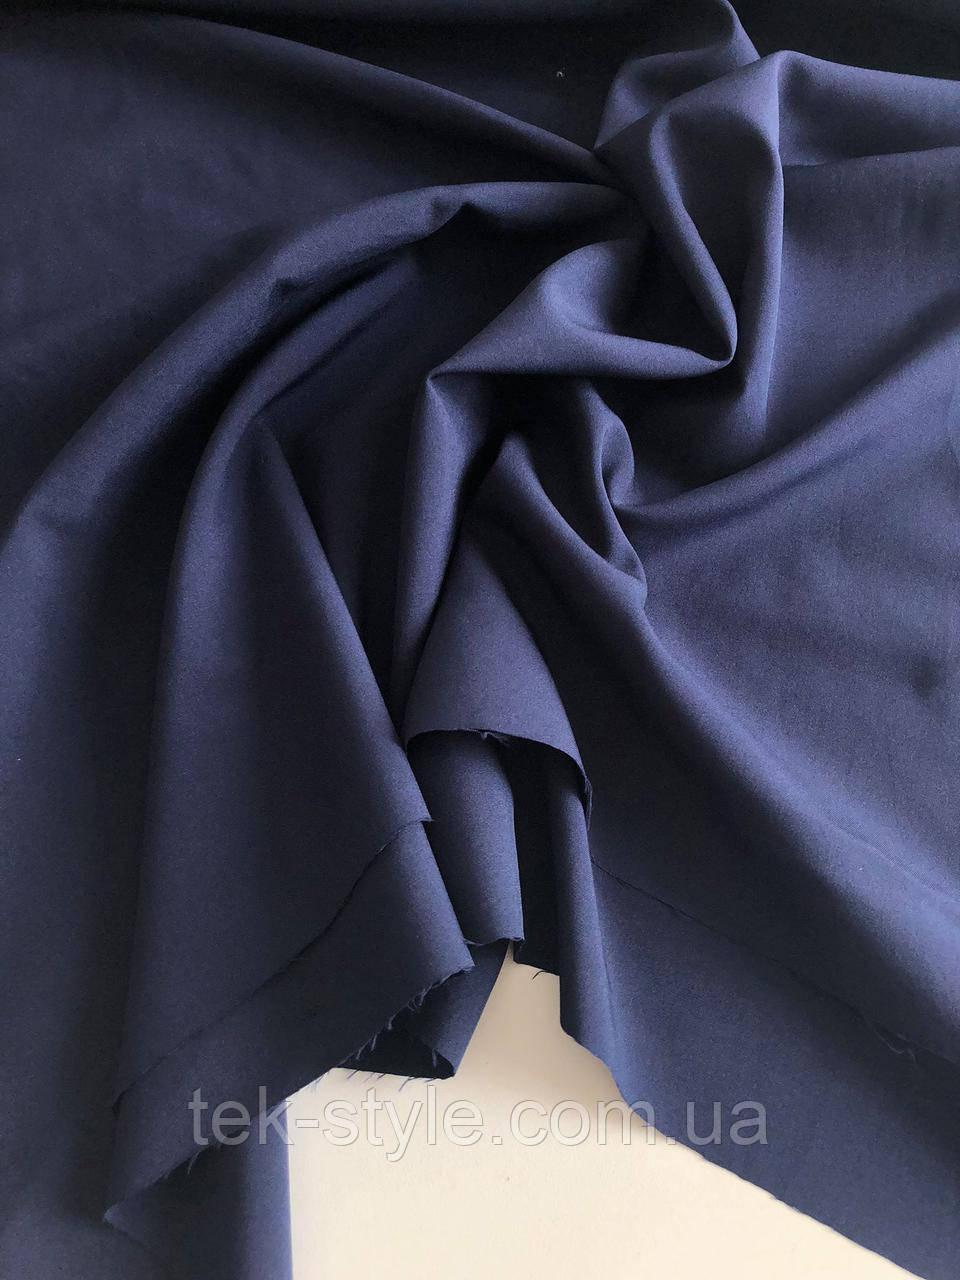 Суперсофт темно синий